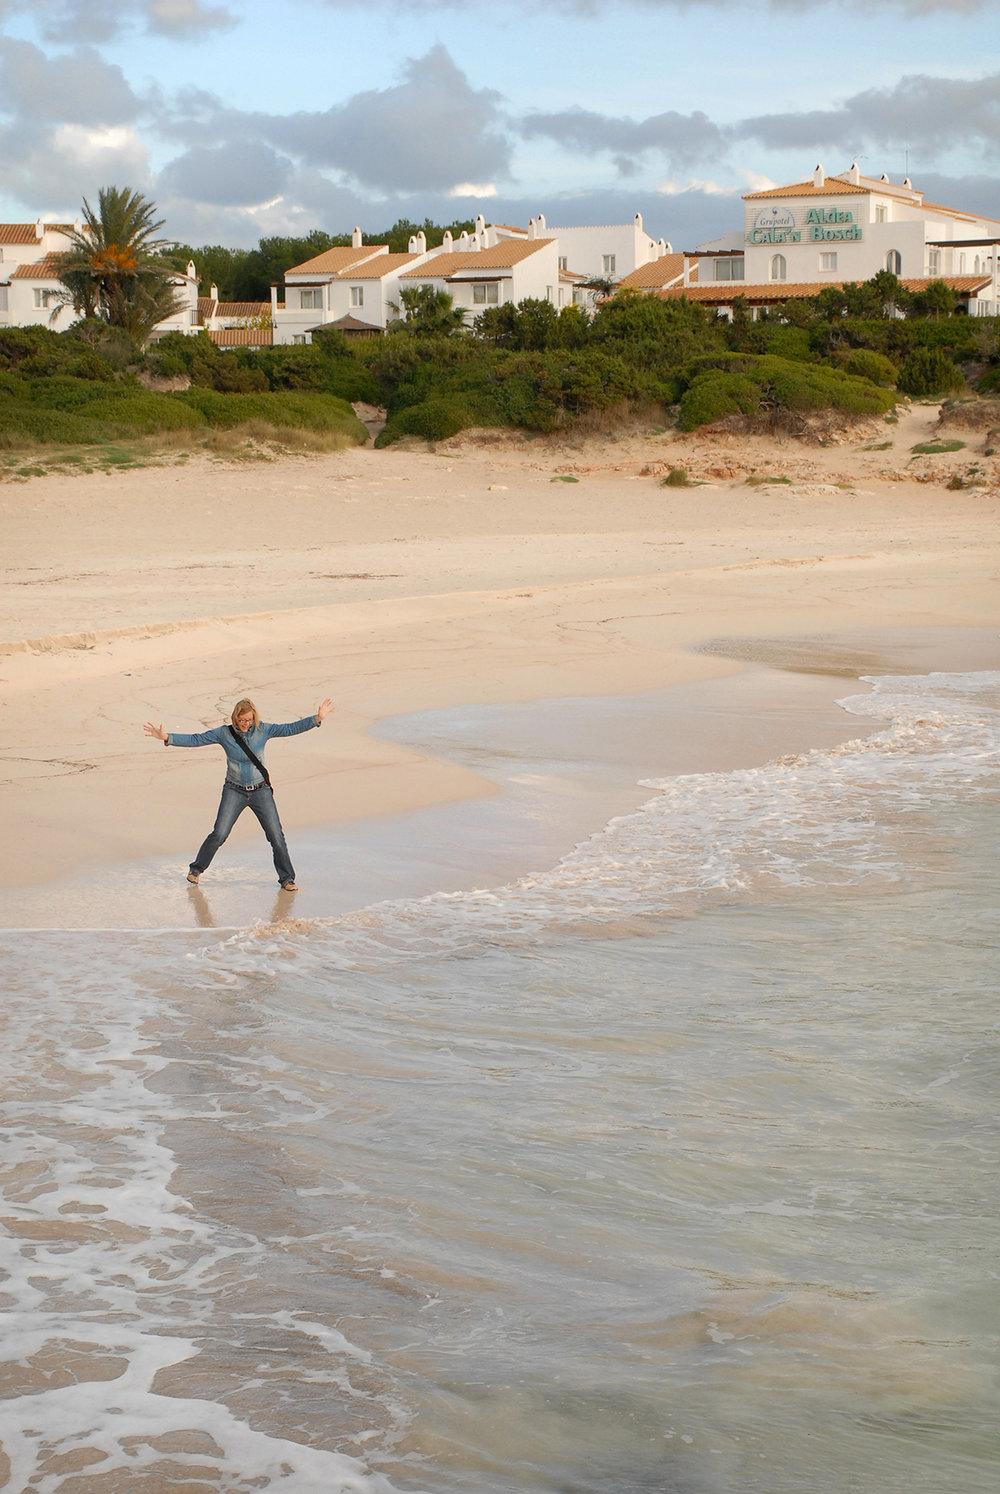 Menorca, ranta, talvi, Välimeri, matka, matkablogi, loma